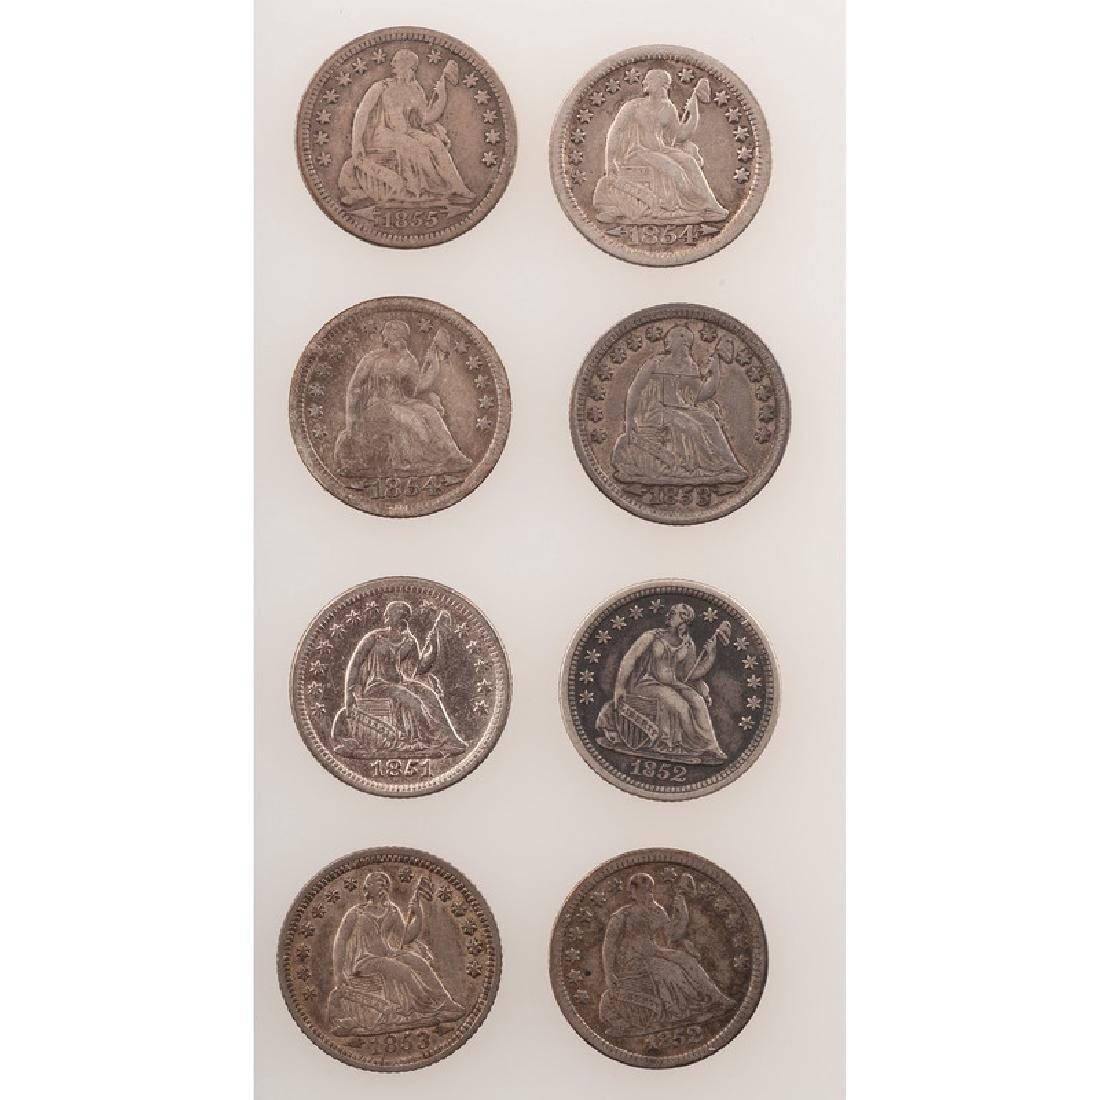 United States Liberty Seated Half Dimes 1851-1854